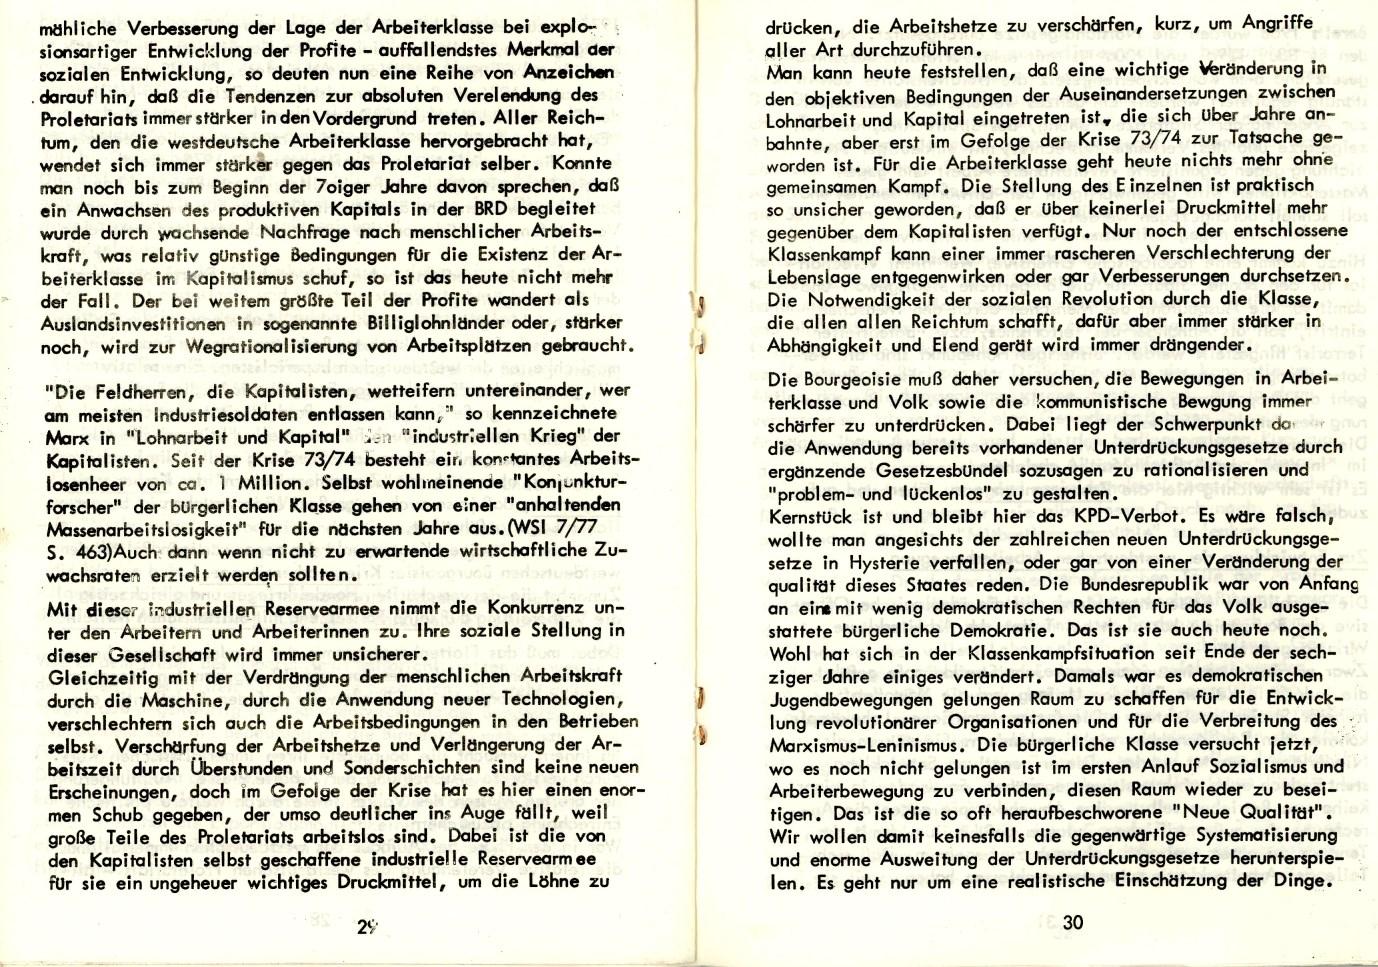 KGBE_1978_Resolutionen_16